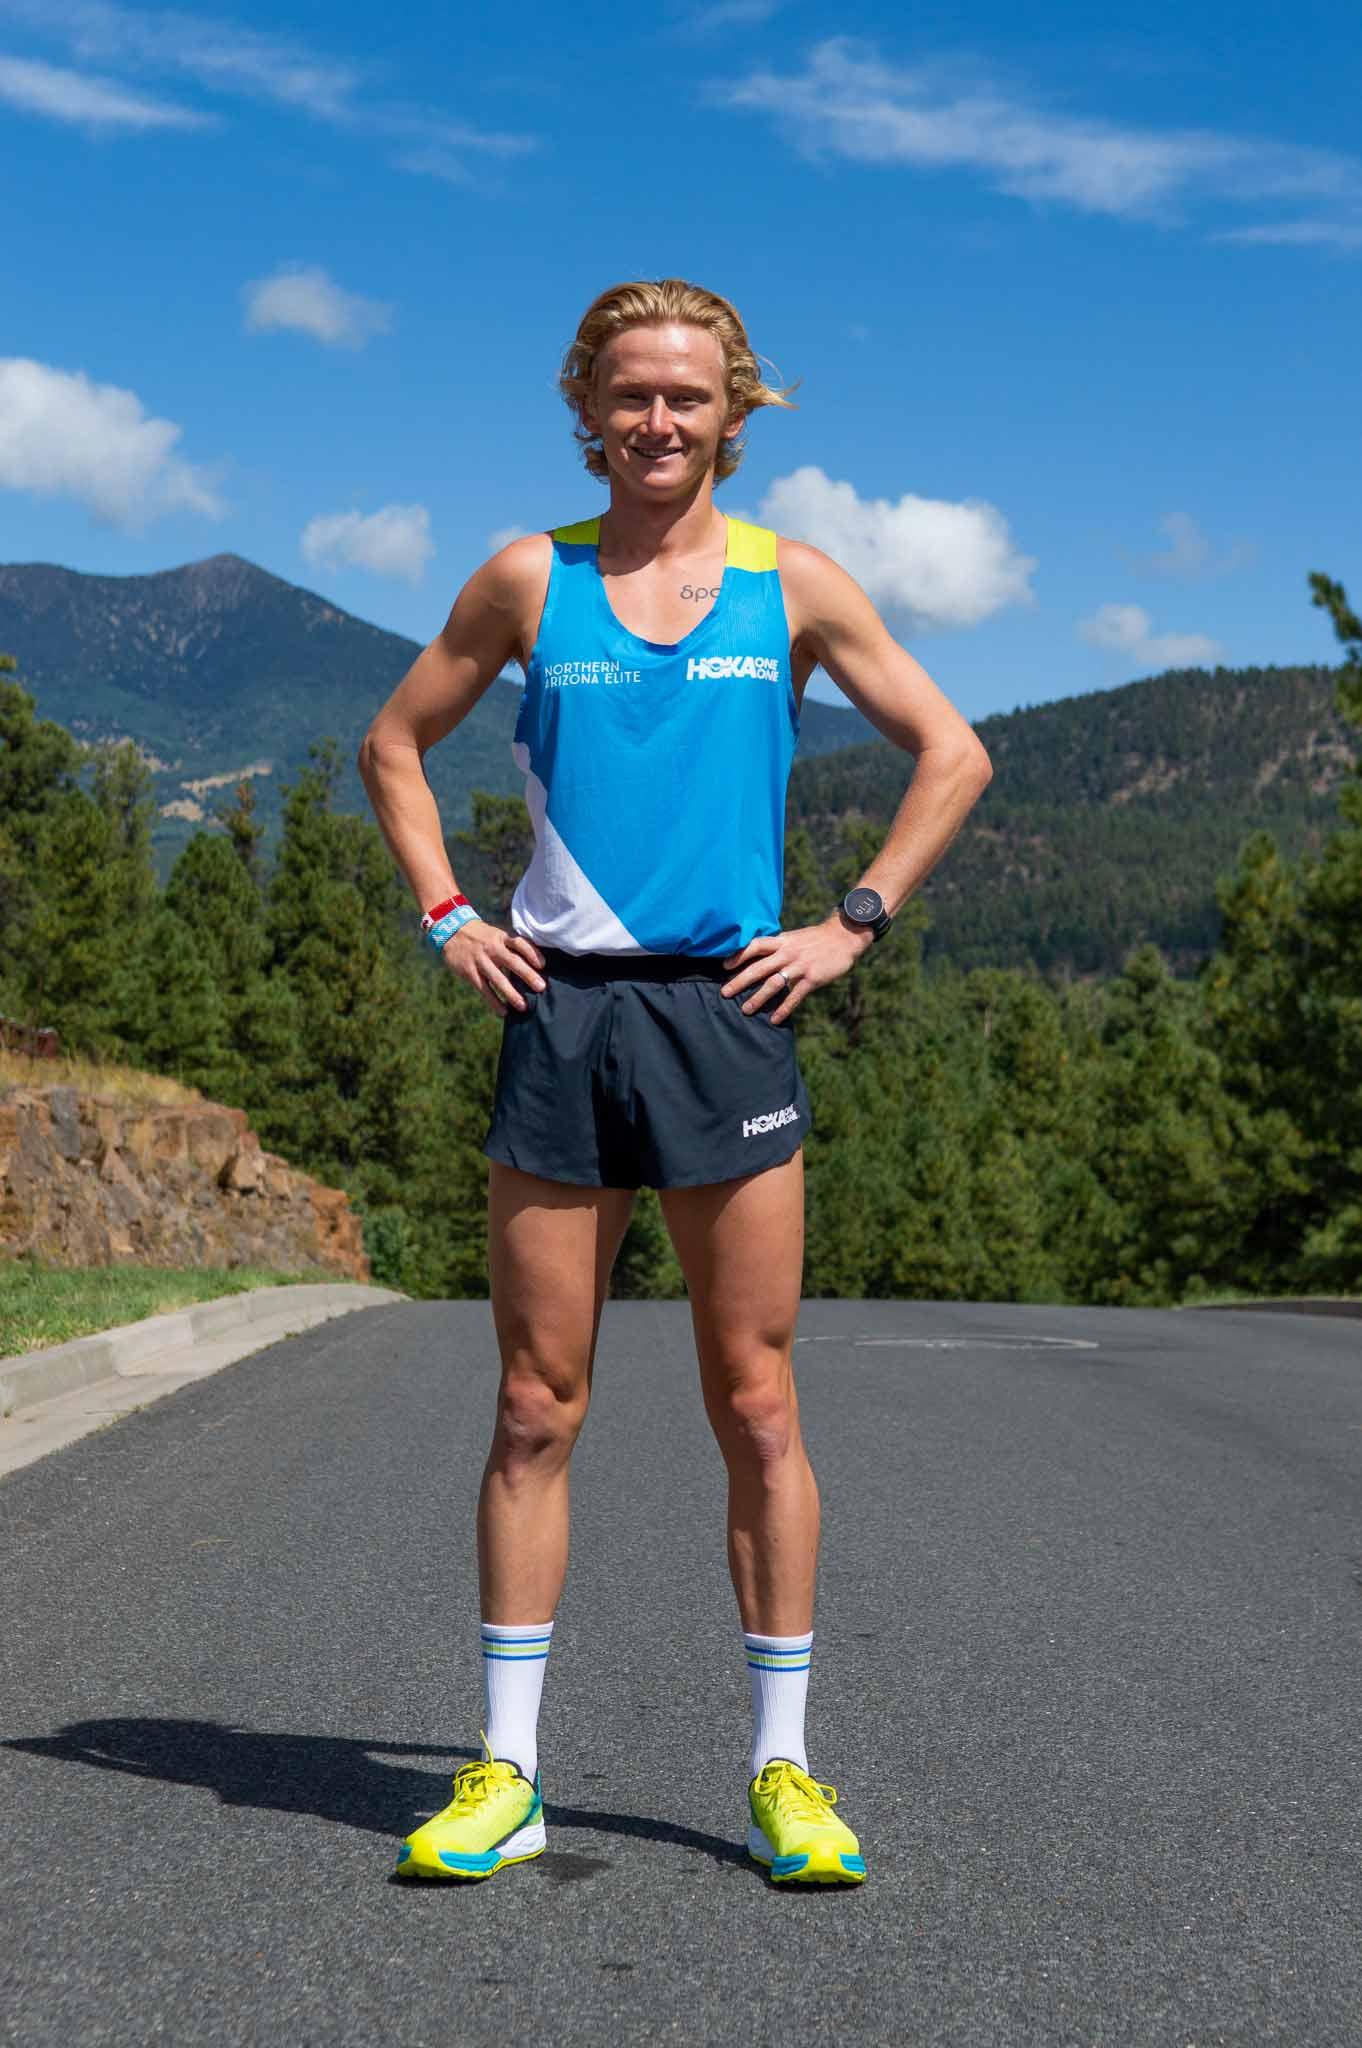 From 10,000m to marathon: HOKA Athlete Rory Linkletter's marathon debut in Toronto